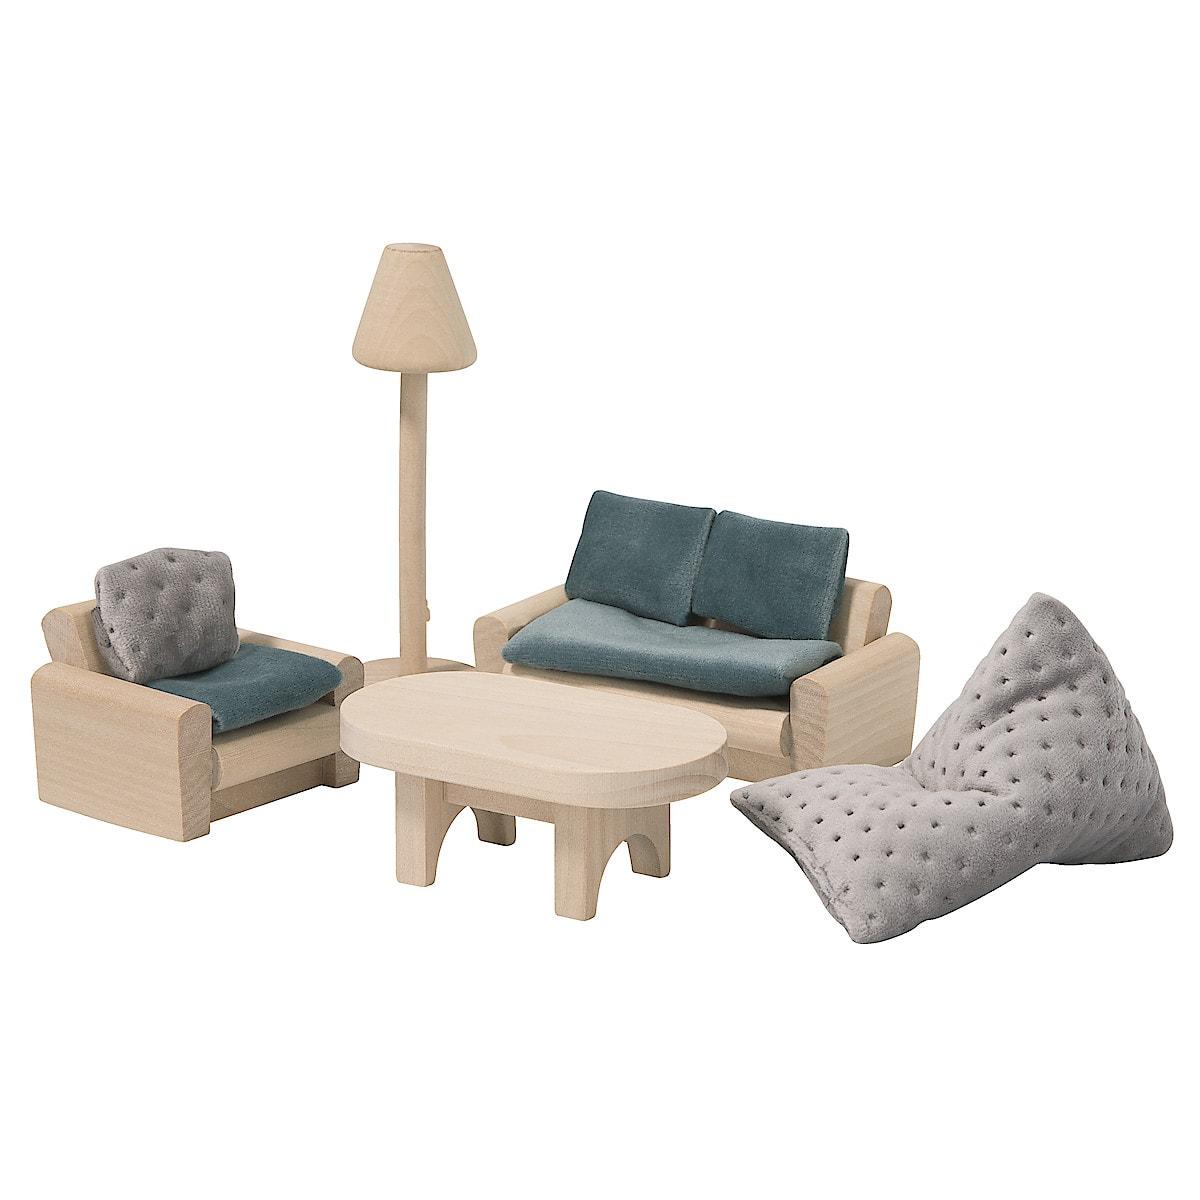 Dockskåpsmöbler vardagsrum